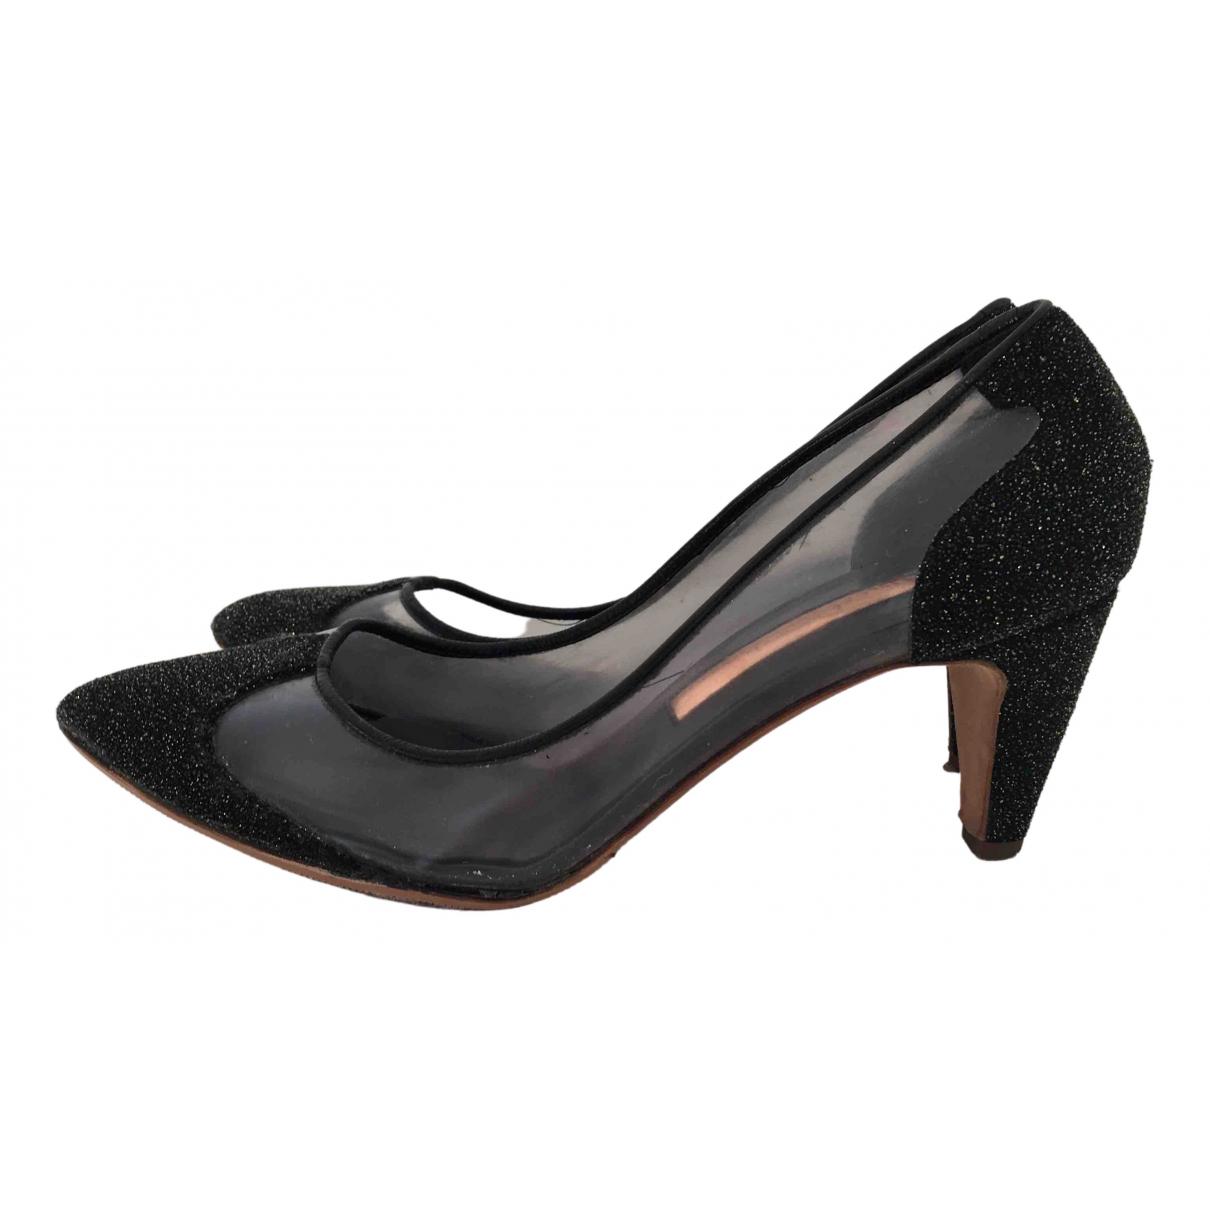 Rupert Sanderson \N Black Leather Heels for Women 39 EU